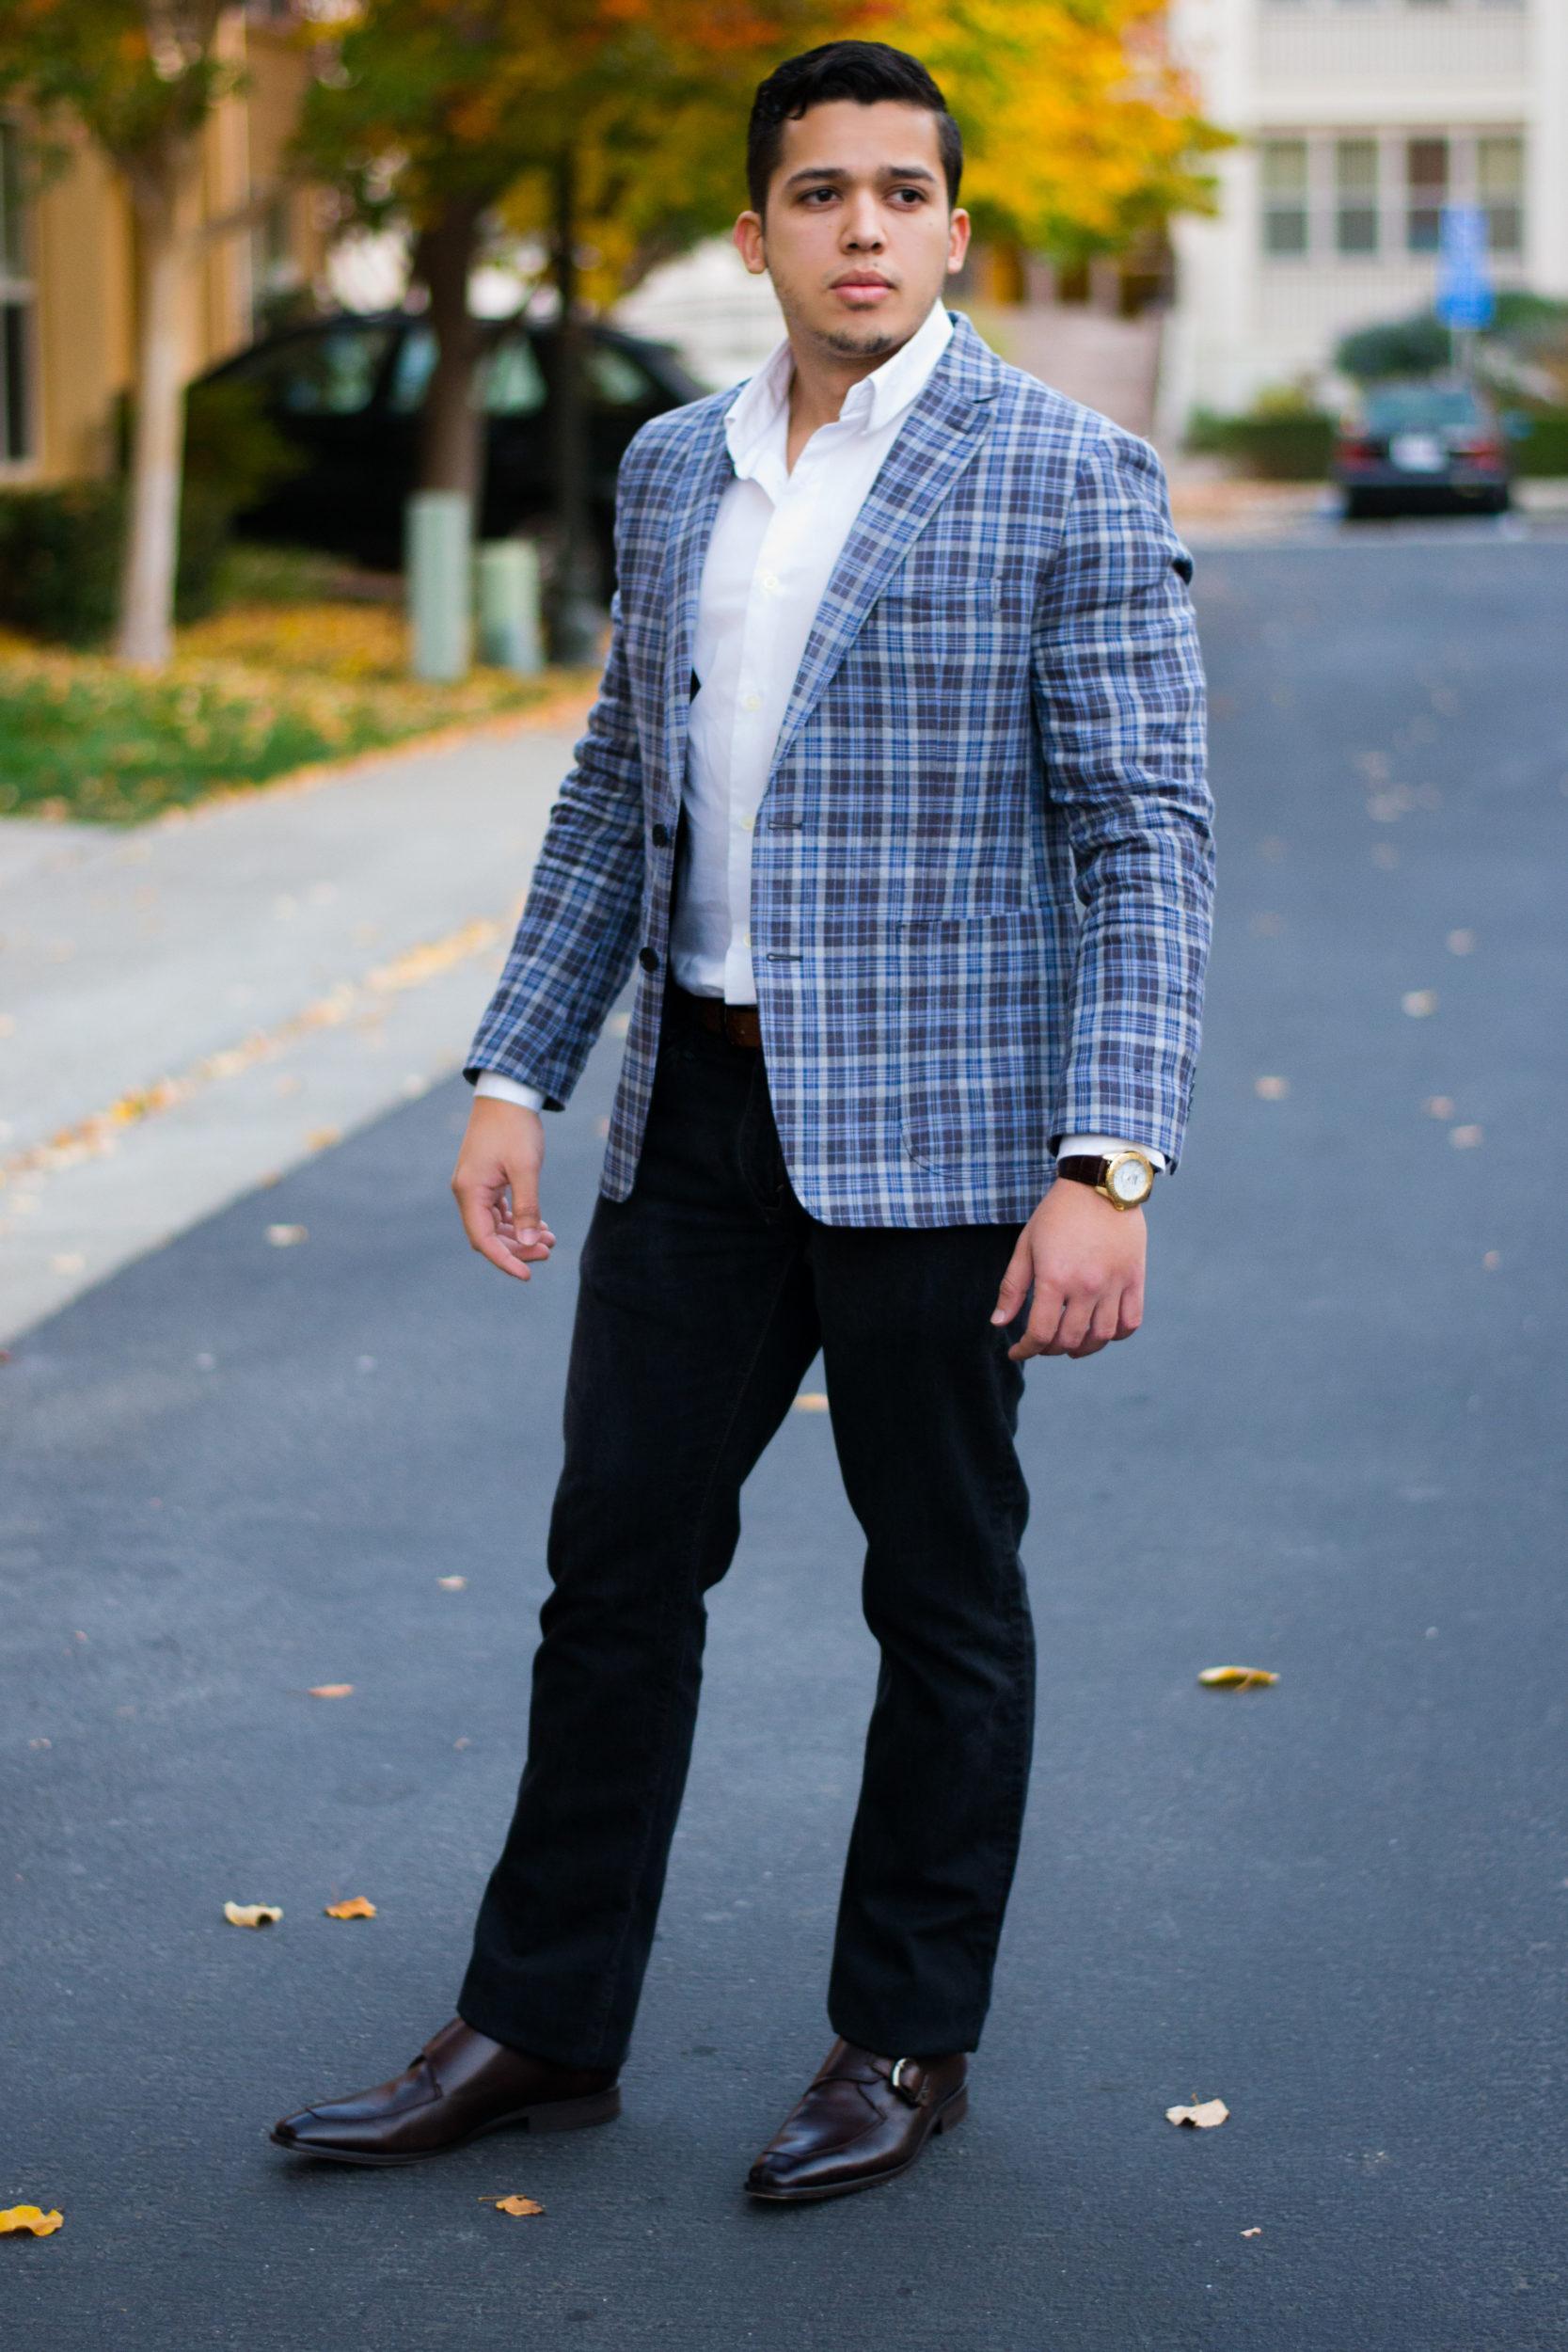 jeans blazer business casual photo - 1